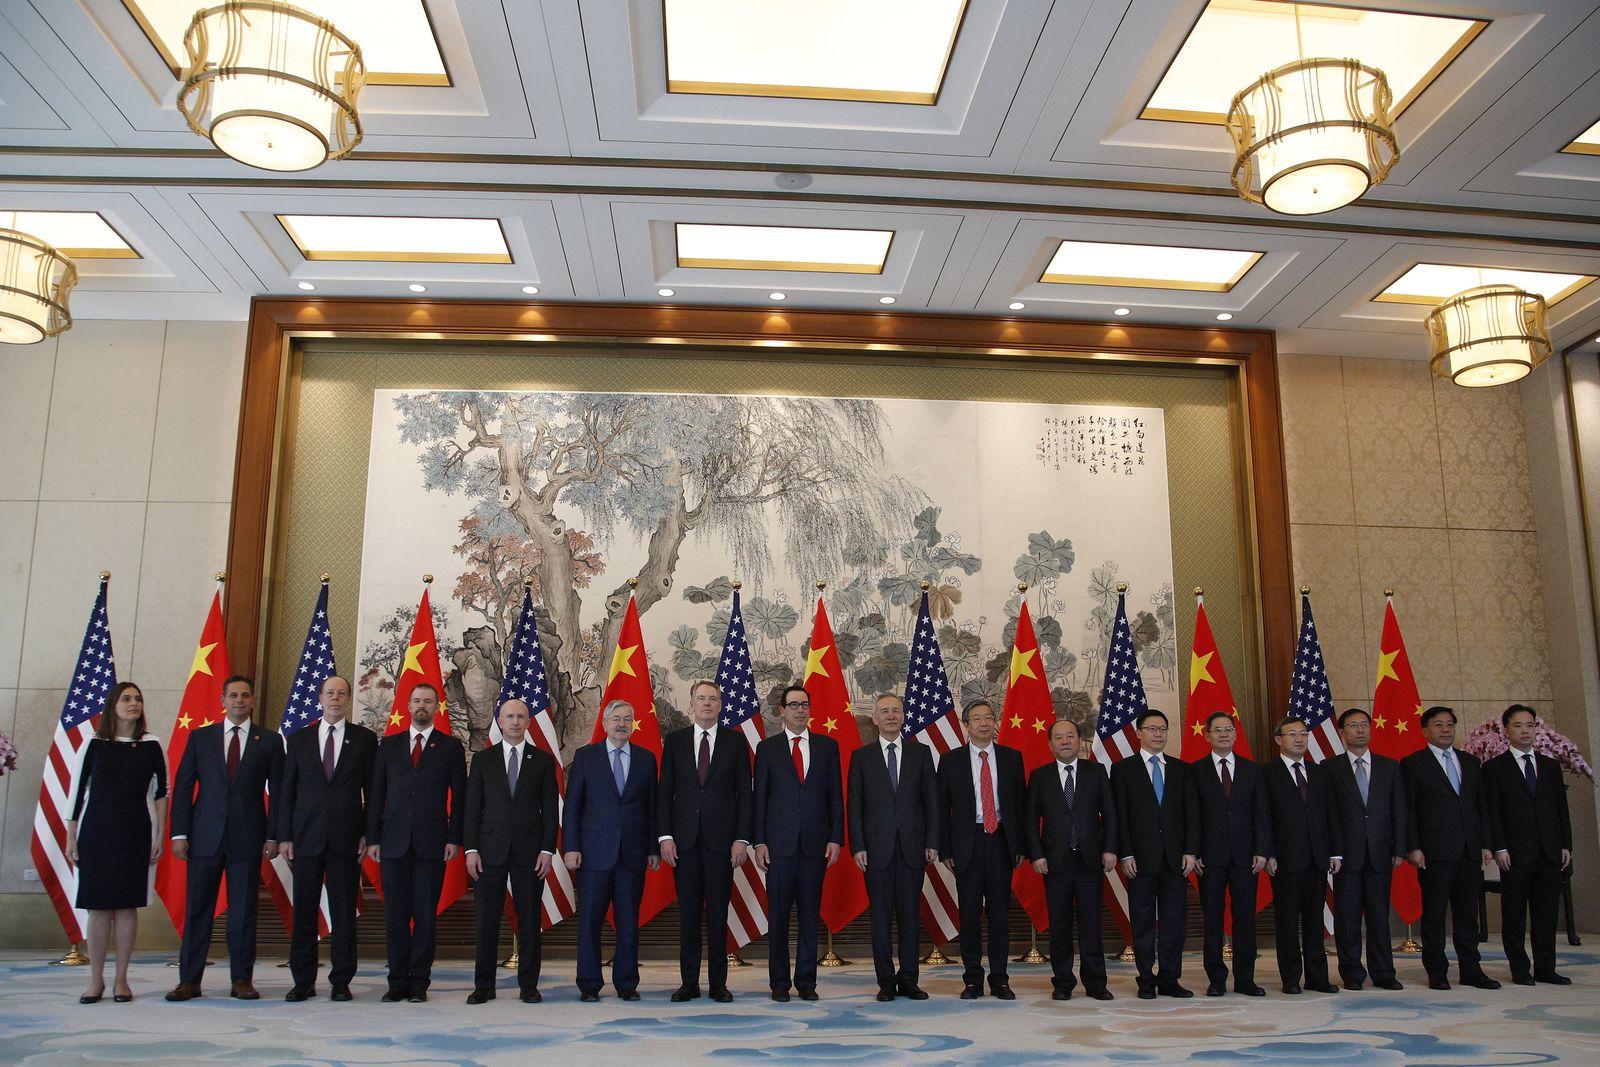 USA/ China/ Delegation